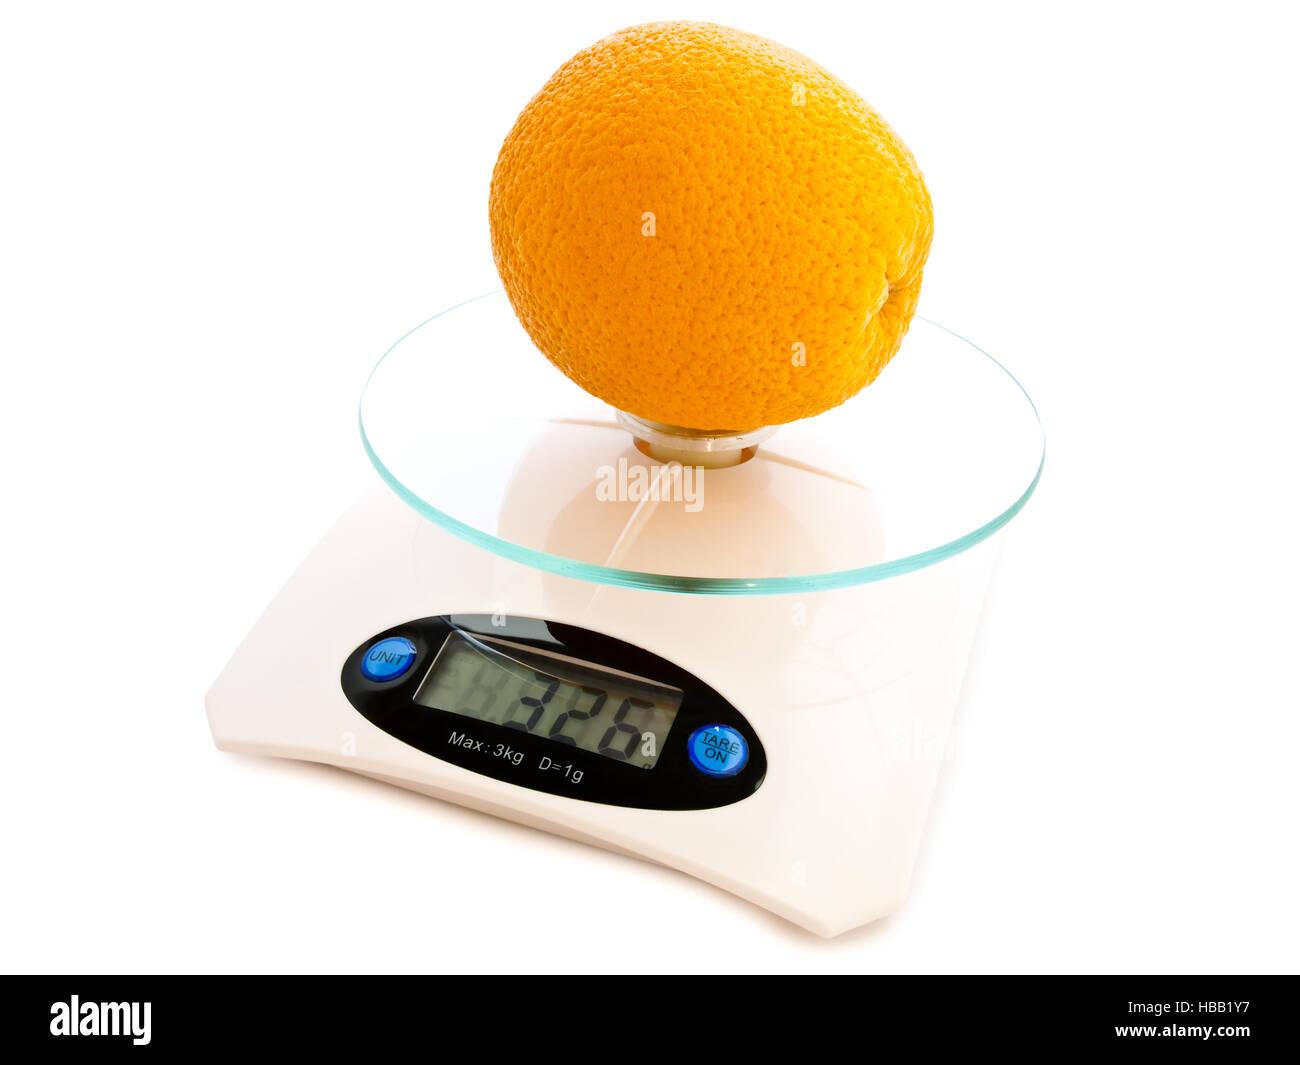 Orange - Stock Image